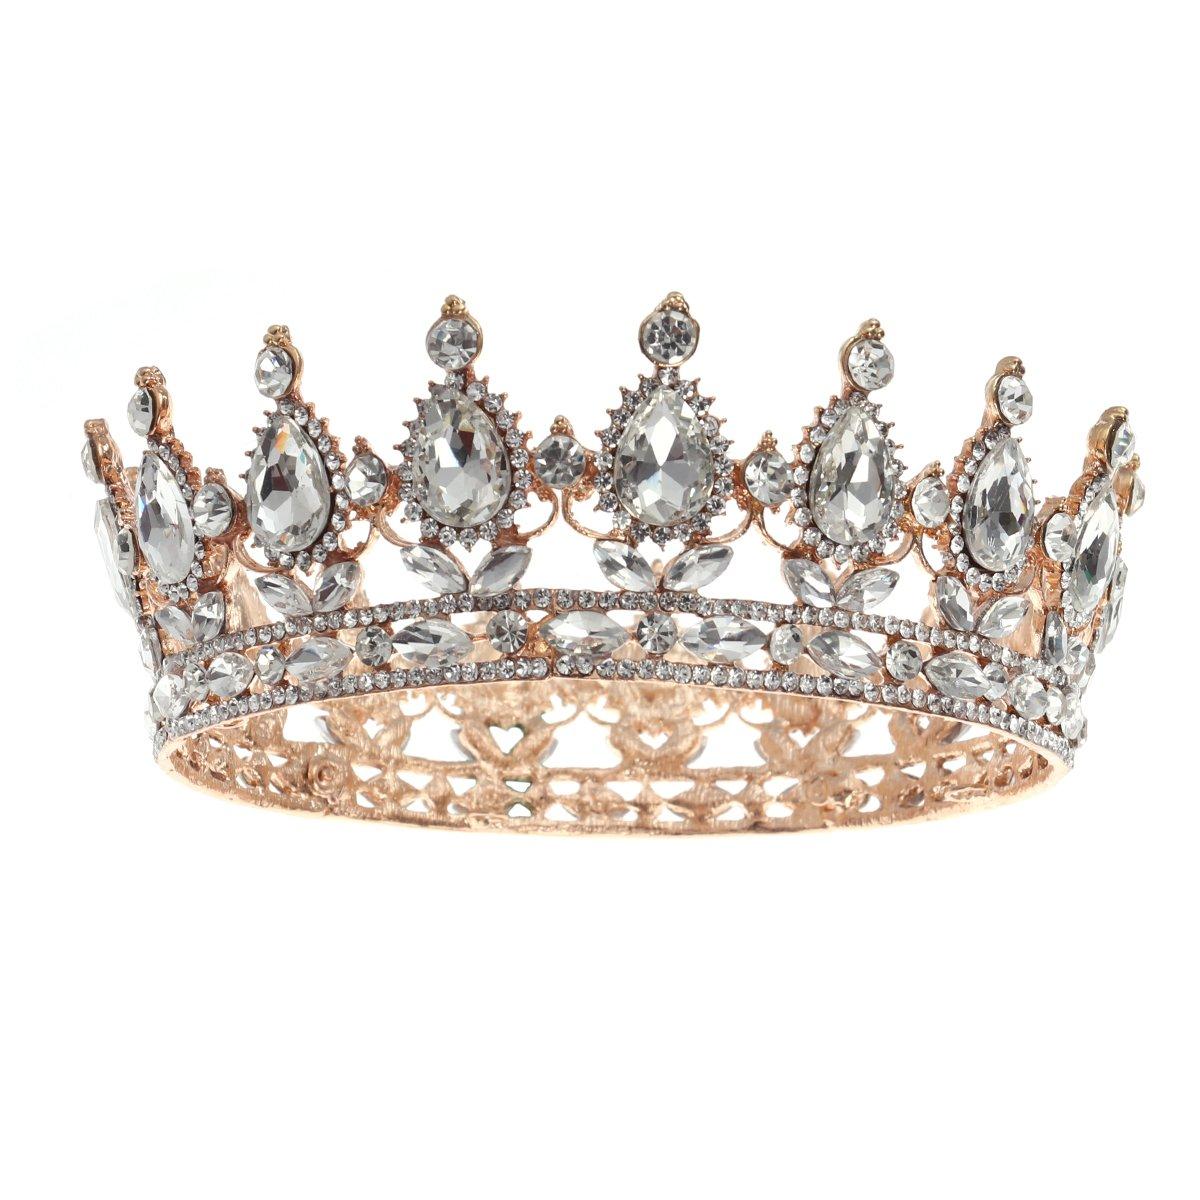 Frcolor Vintage Tiara Crown Crystal Rhinestone Pageant Queen Crown Tiara Hair Jewelry